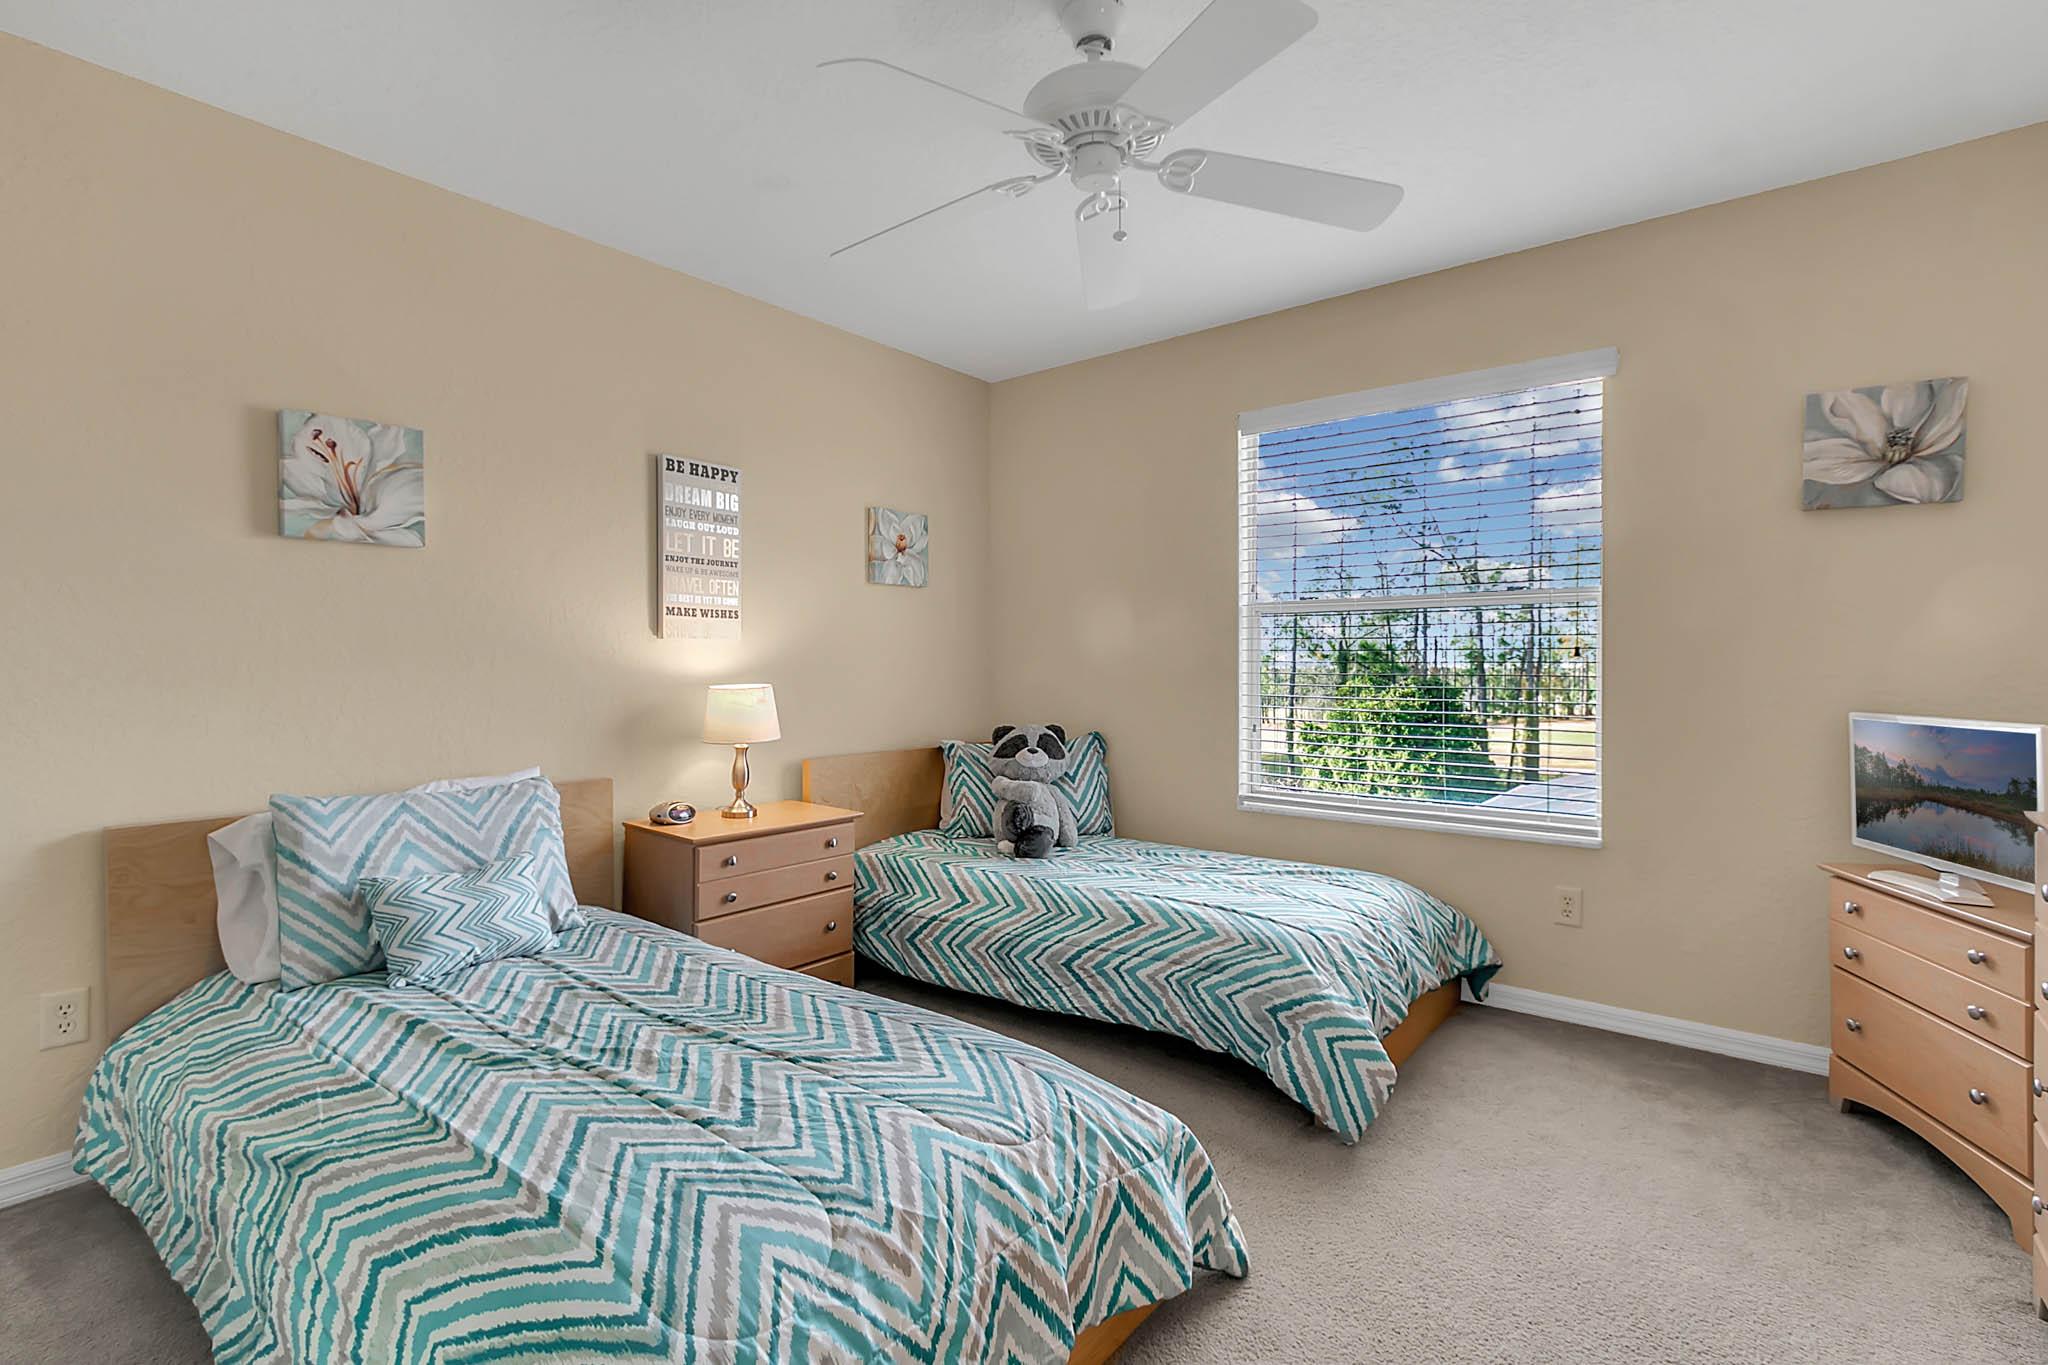 229-N-Hampton-Dr--Davenport--FL-33897----23---Bedroom.jpg